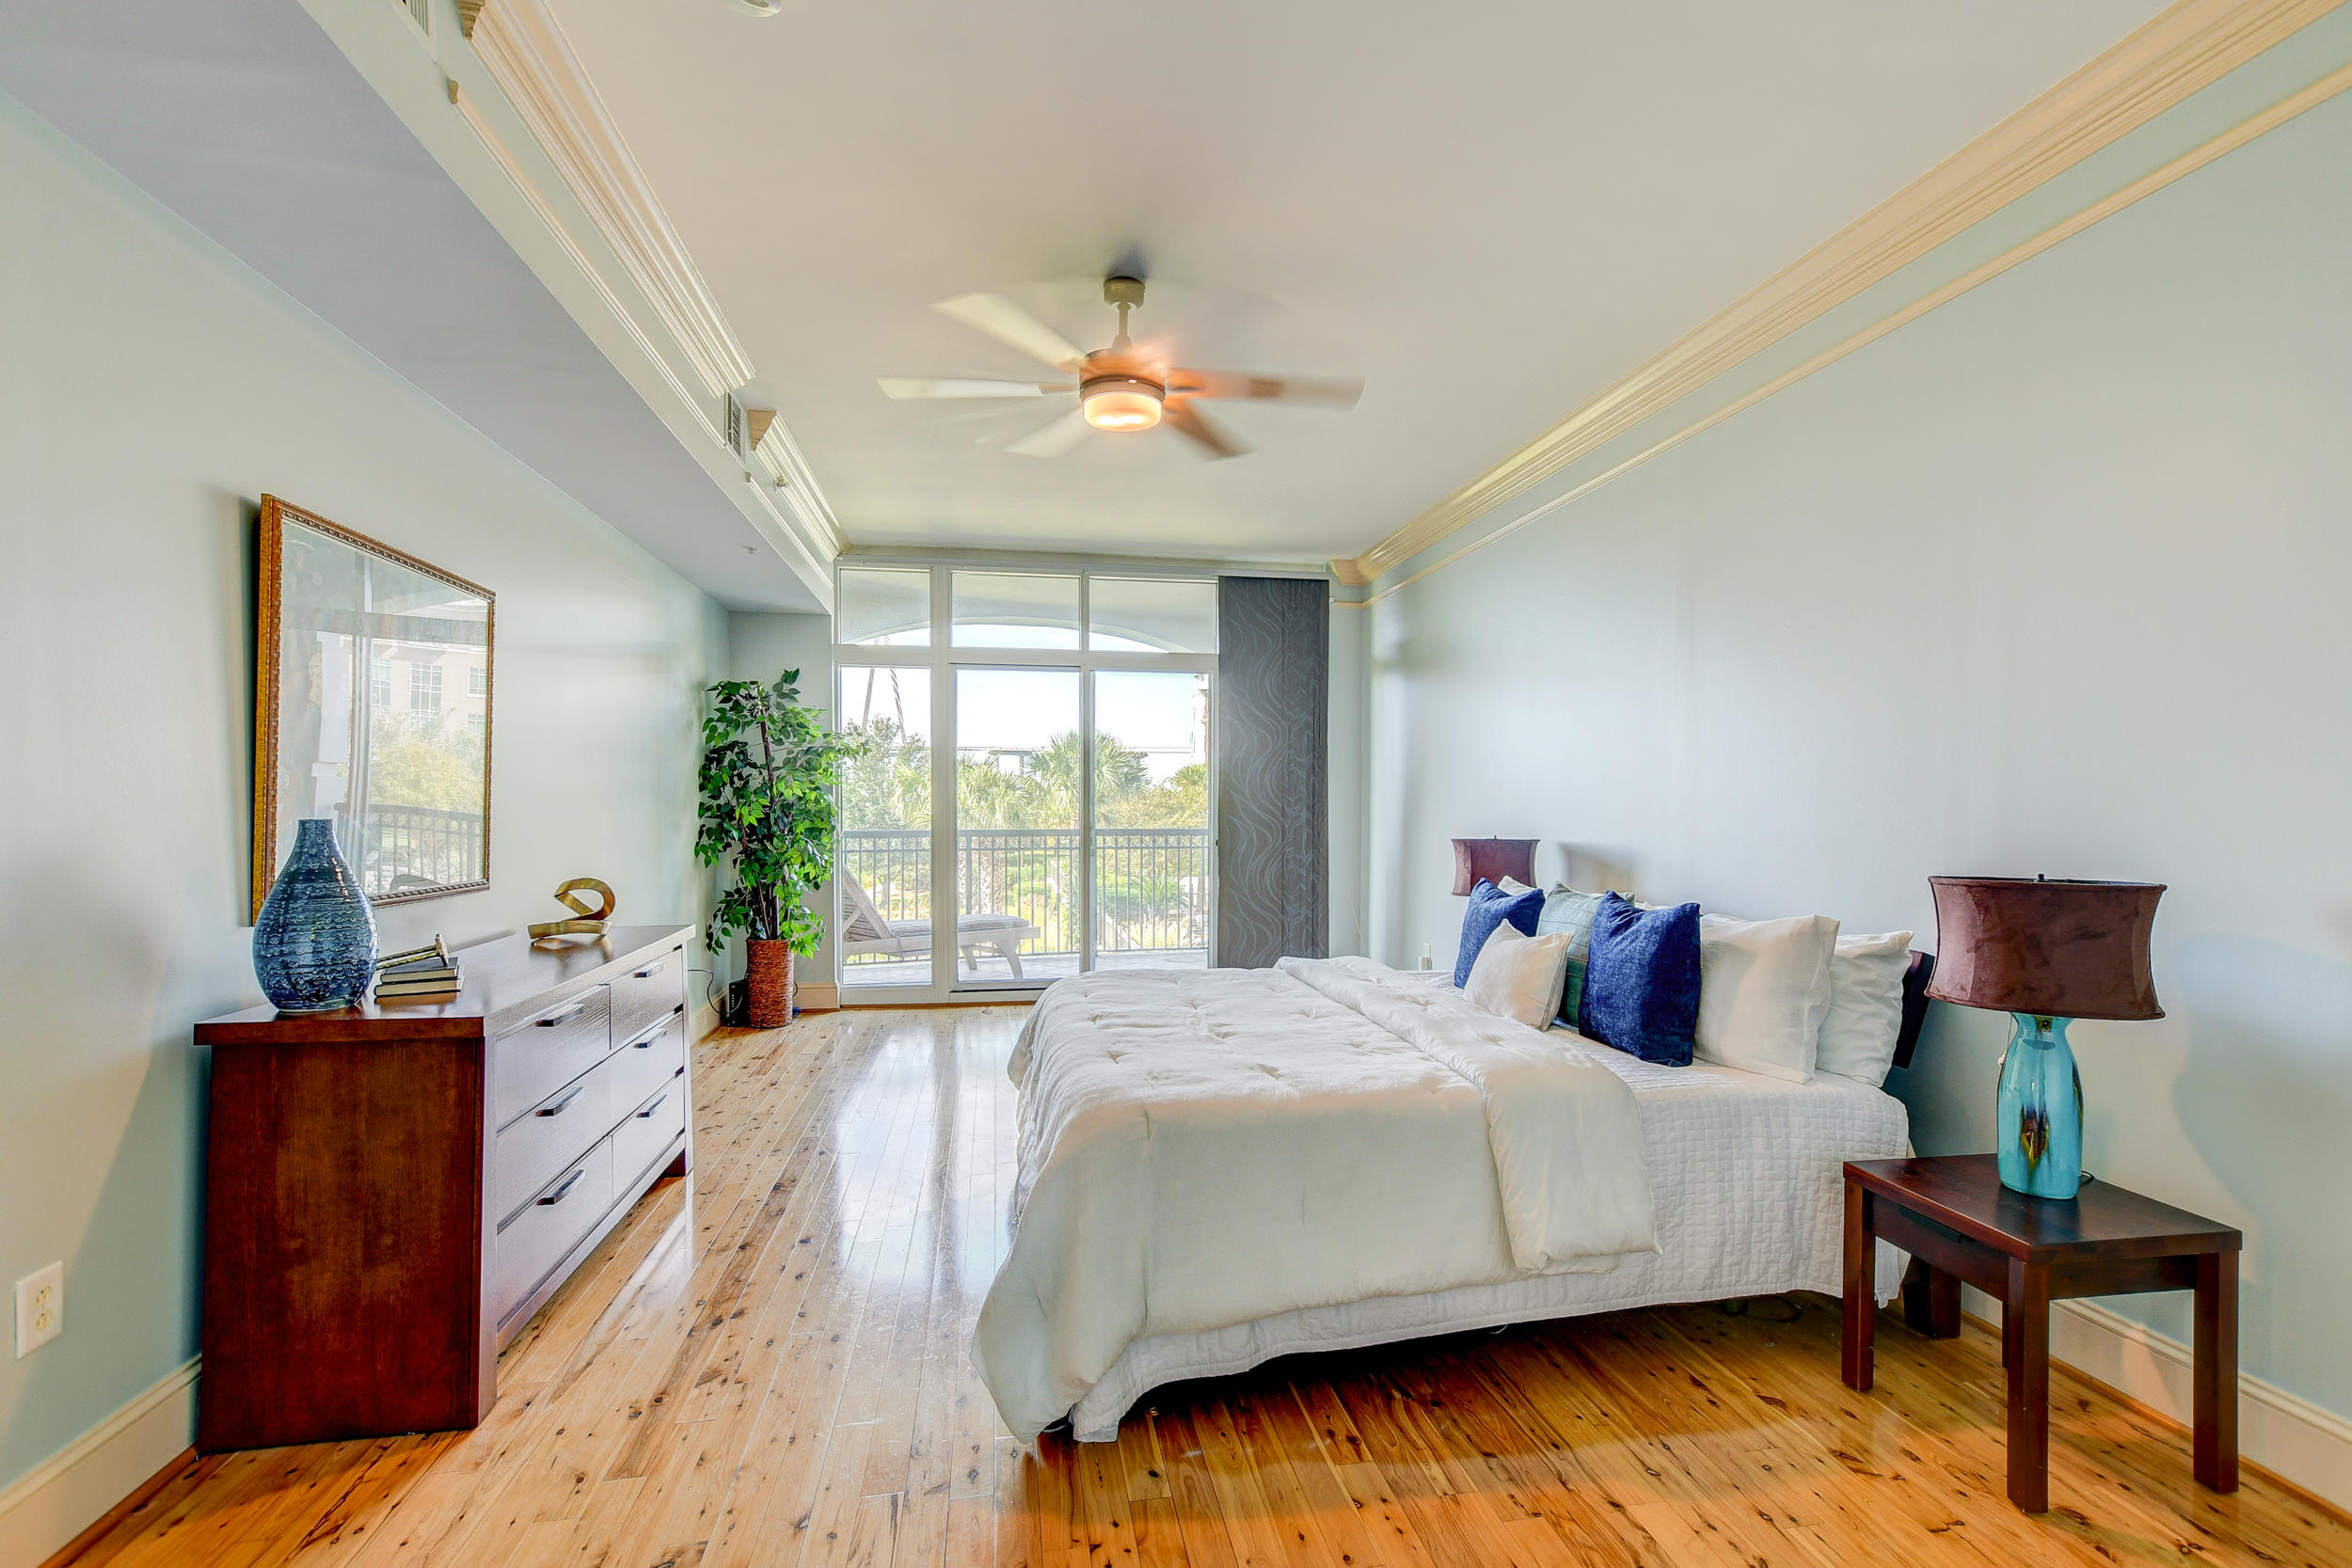 Renaissance On Chas Harbor Homes For Sale - 224 Plaza, Mount Pleasant, SC - 14